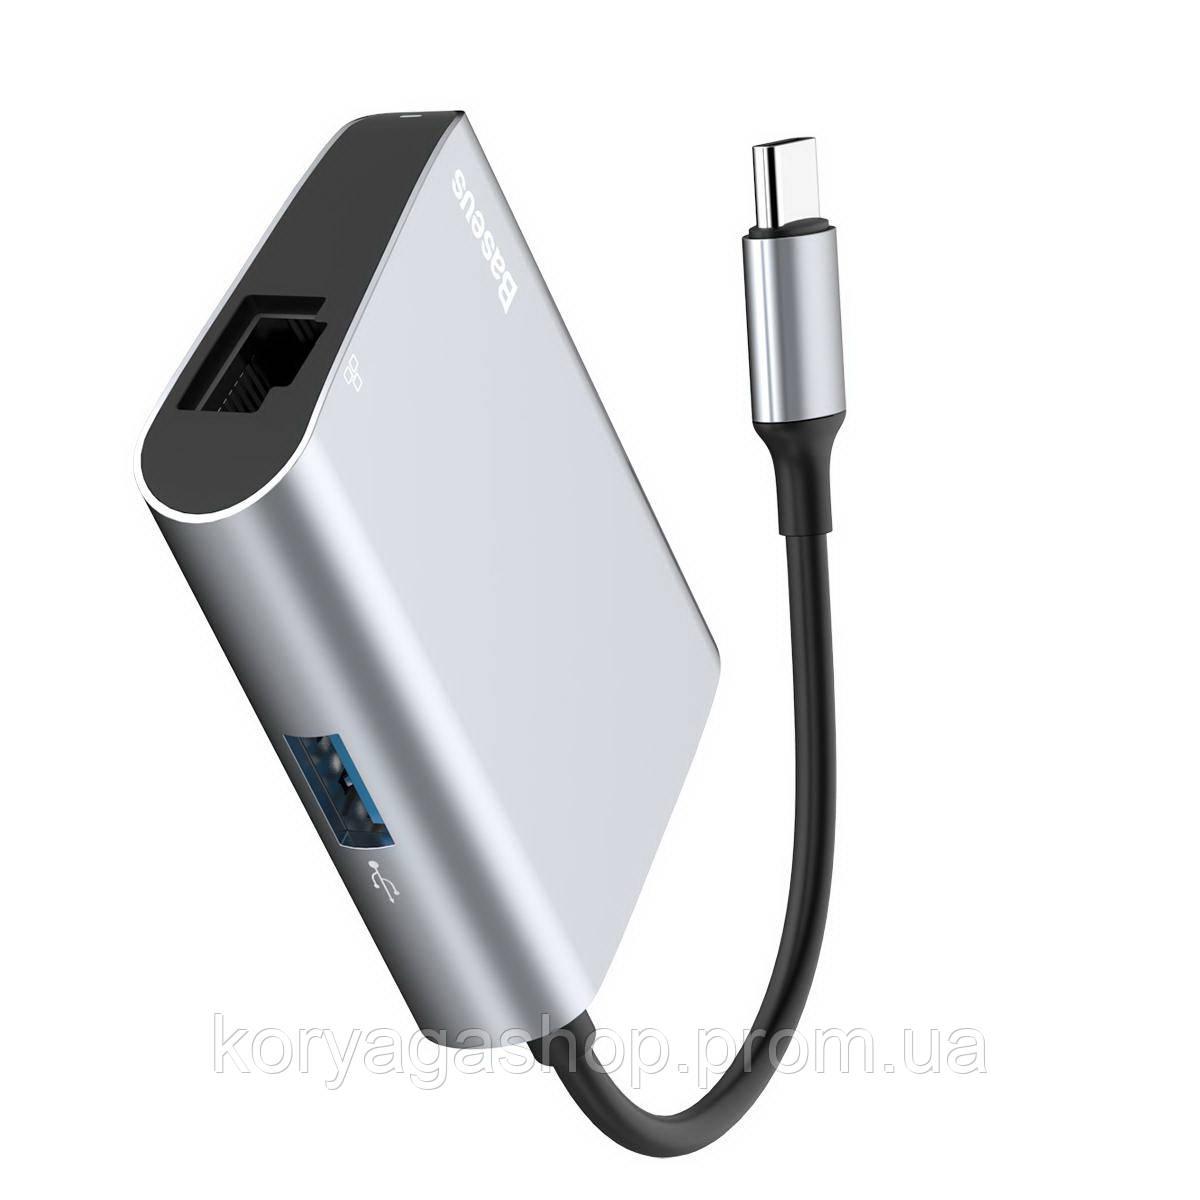 USB-хаб Baseus Enjoyment series Type-C to RJ45+USB3.0 HUB Adapter Gray